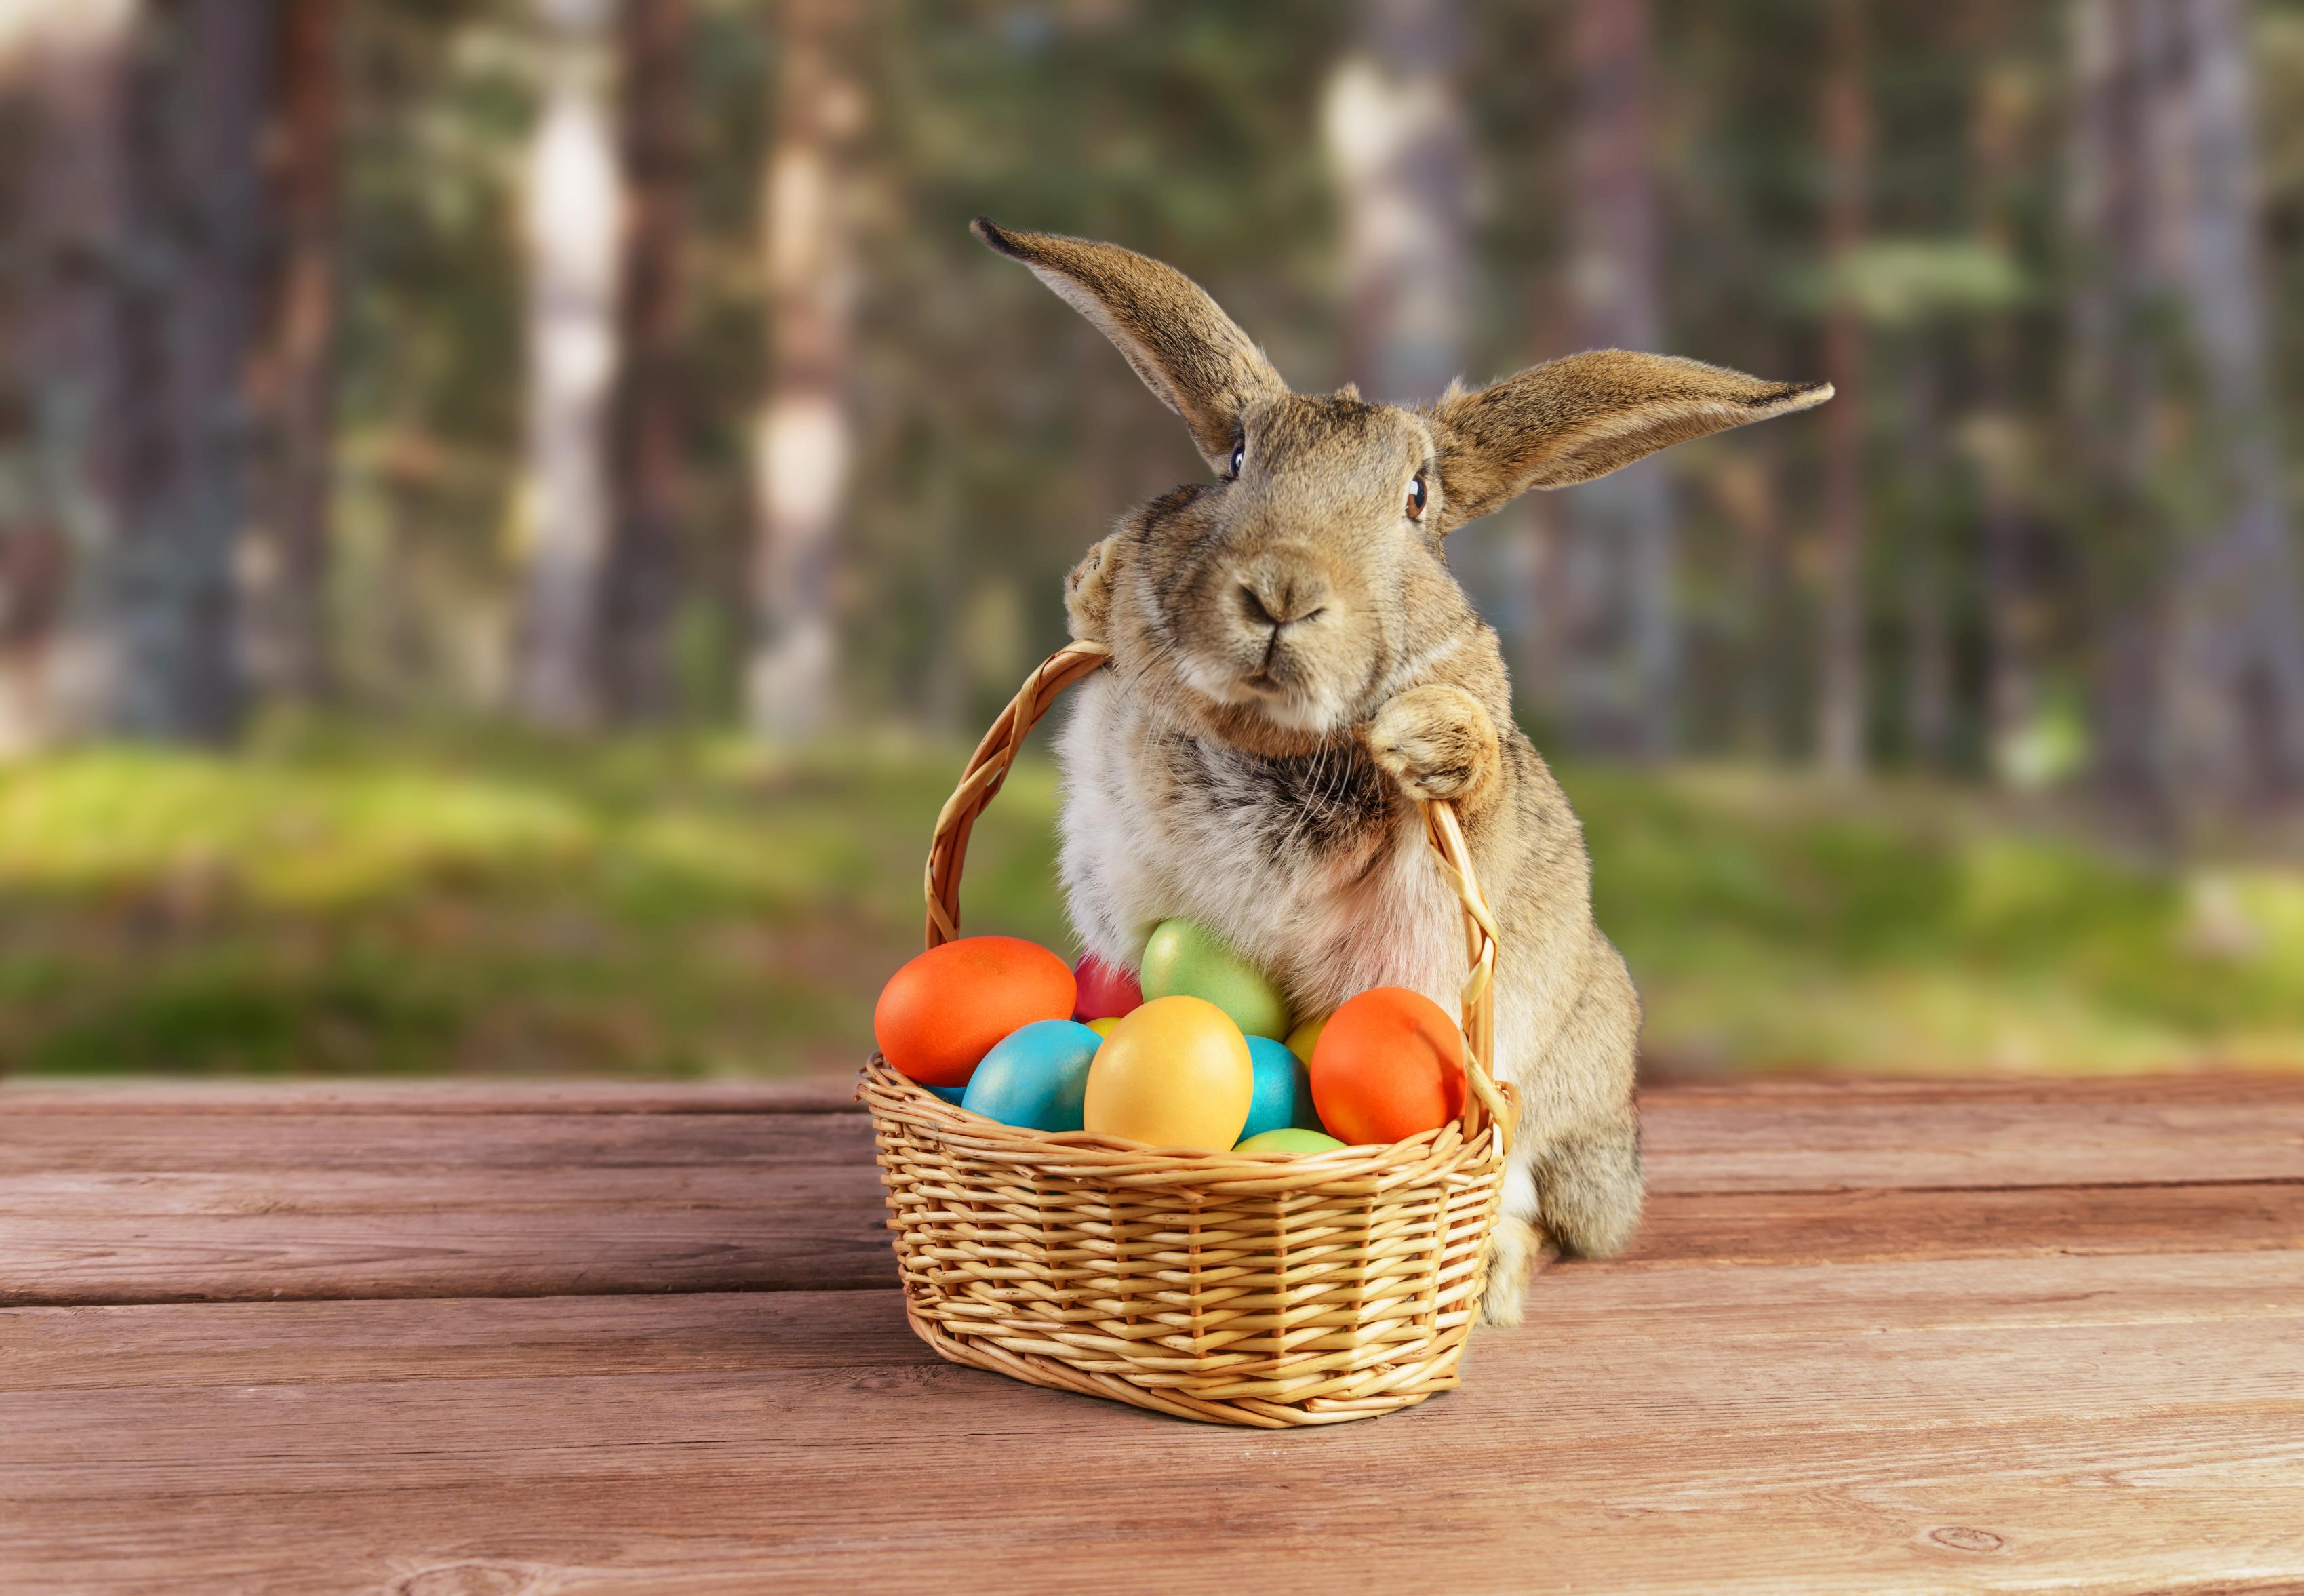 Easter bunny (Photo: Shutterstock)